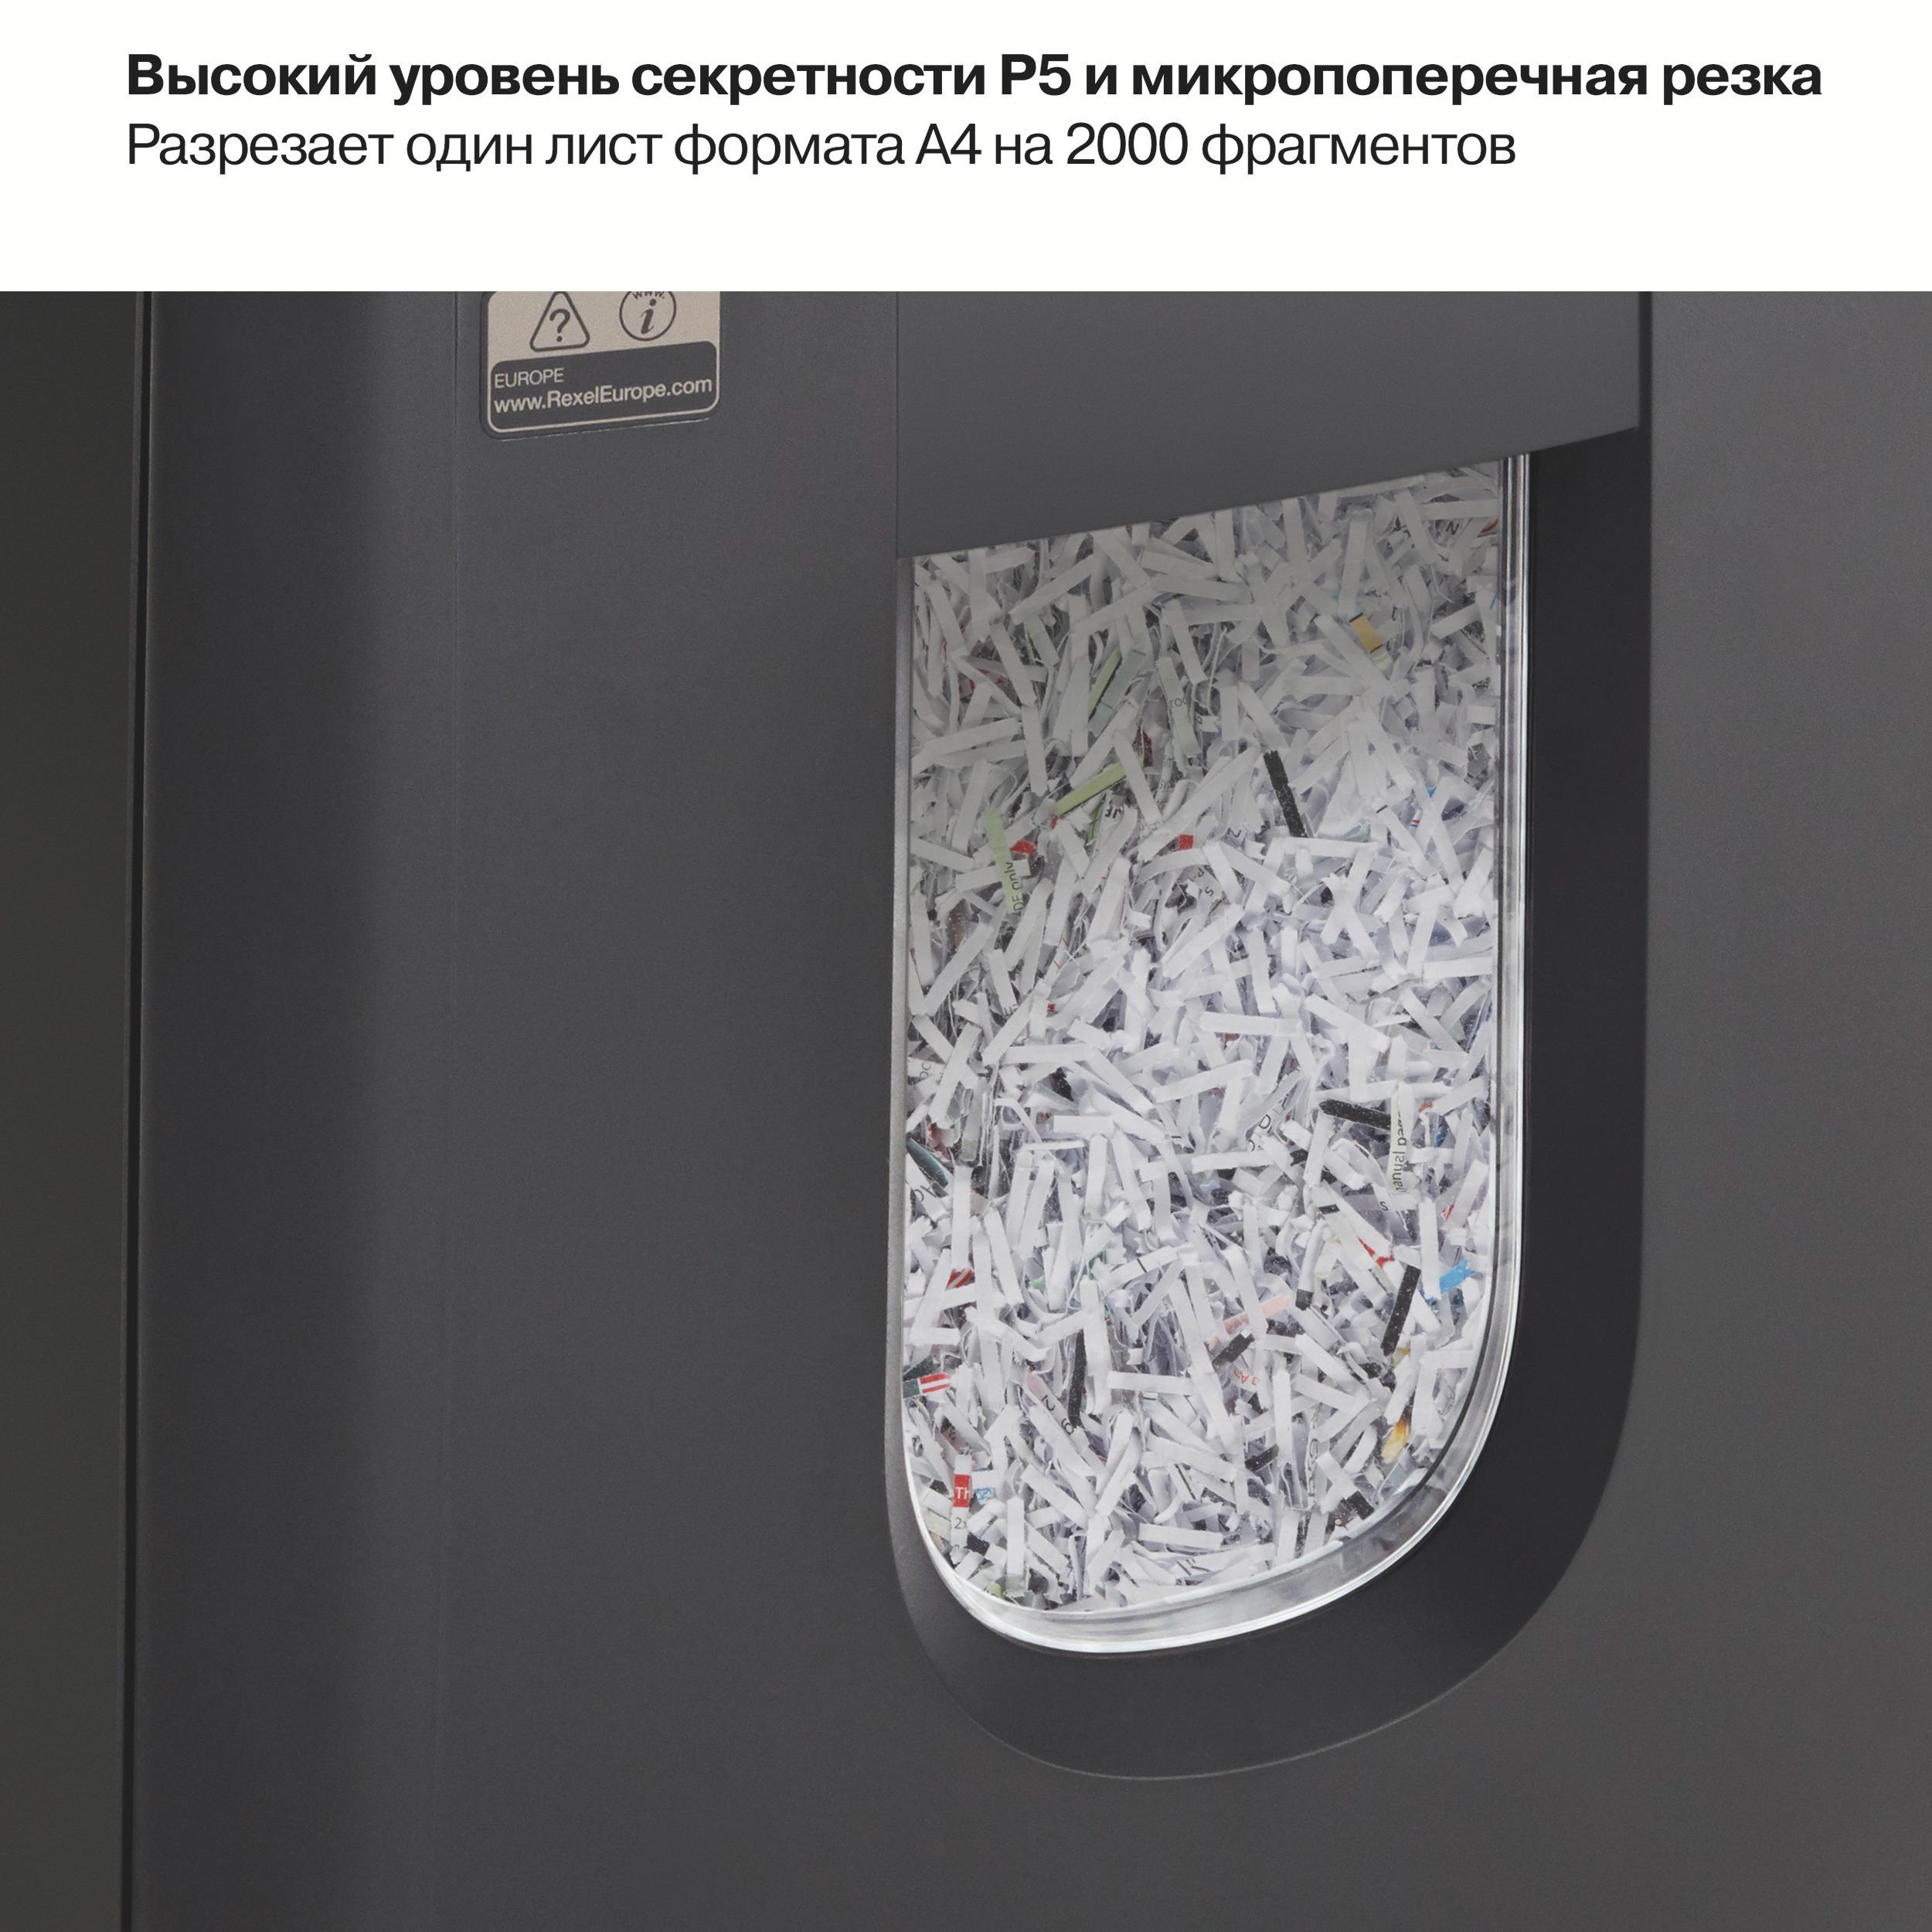 Уничтожитель документов Auto+ 130M. P5 6лист., микро-перекрестная резка, корзина 26л Rexel - фото 7